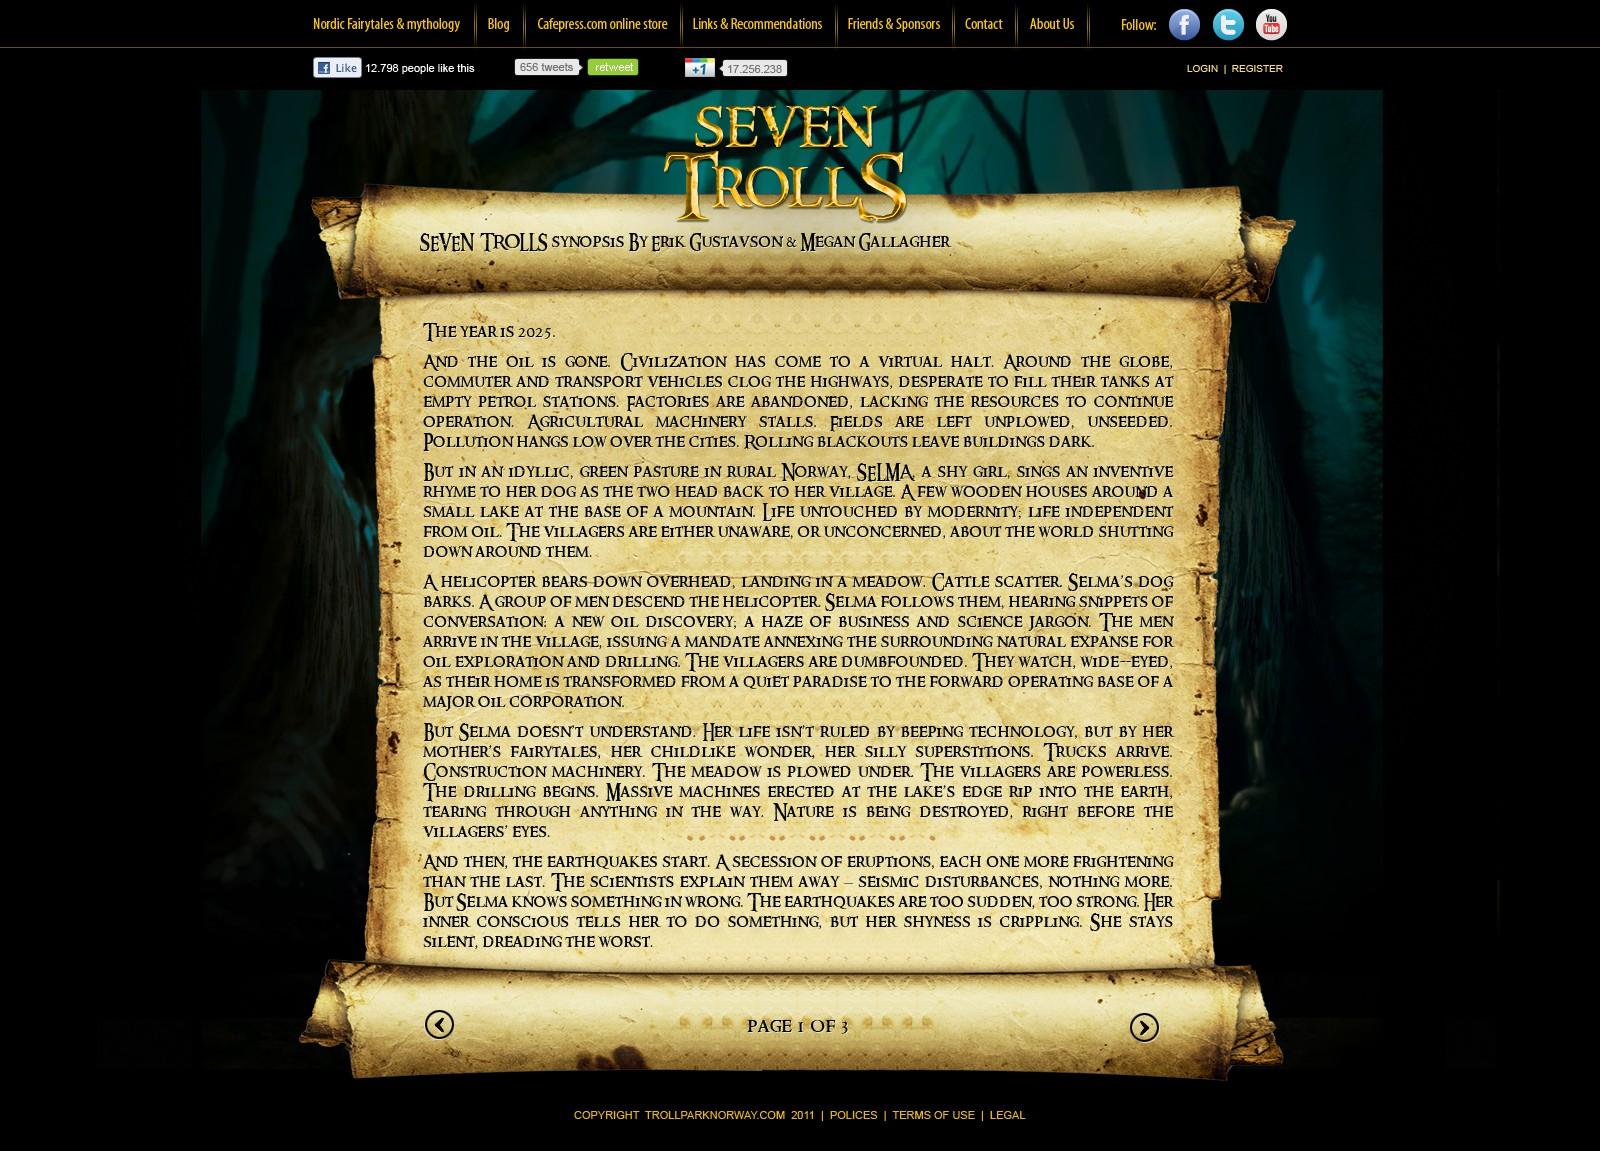 WEBSITE DESIGN :  www.trollparknorway.com  - Theme park / Movie & game needs spectacular website design